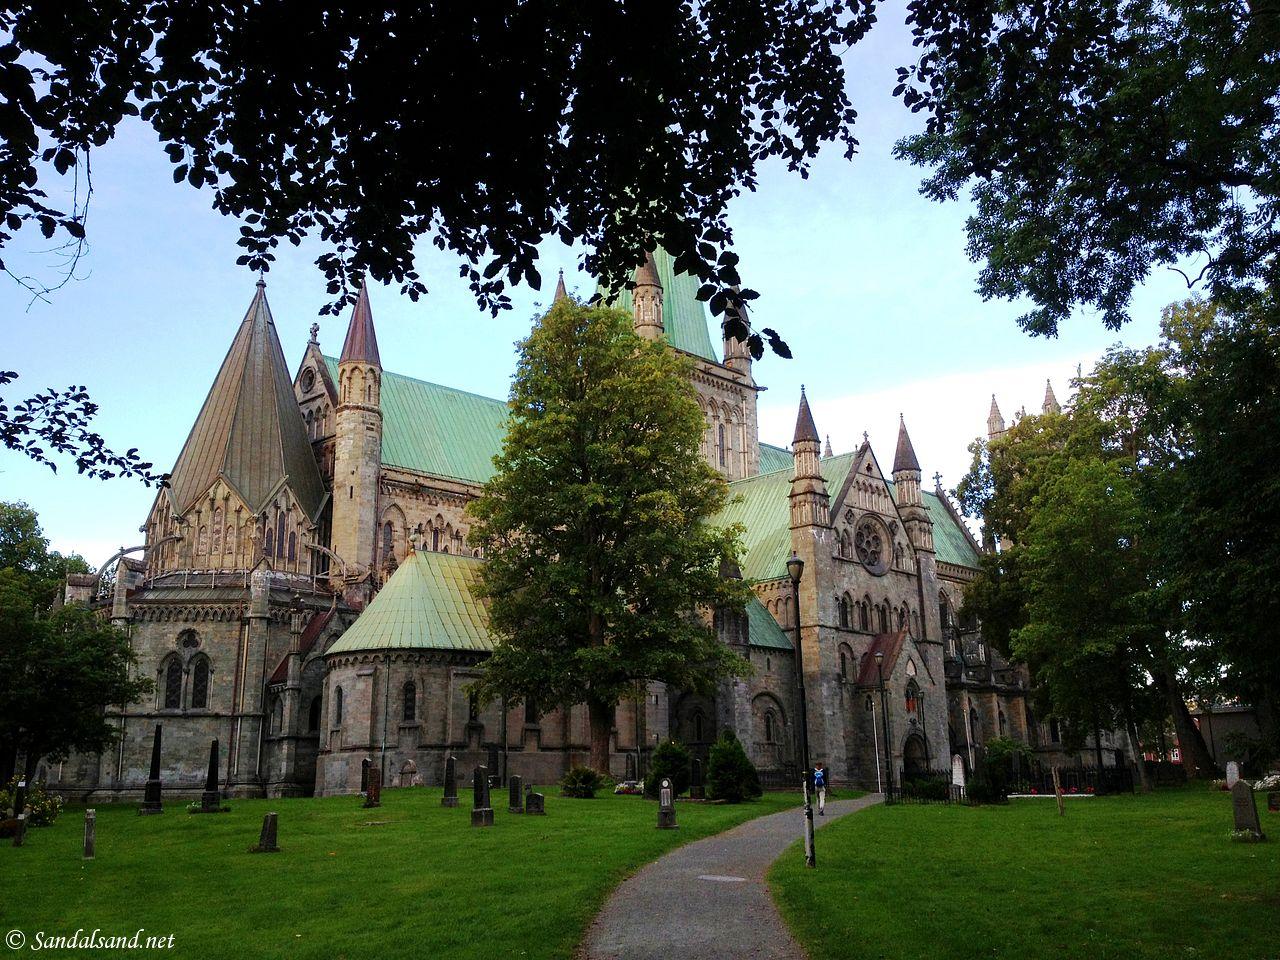 St Olav Cathedral (Nidaros) in Trondheim, Norway